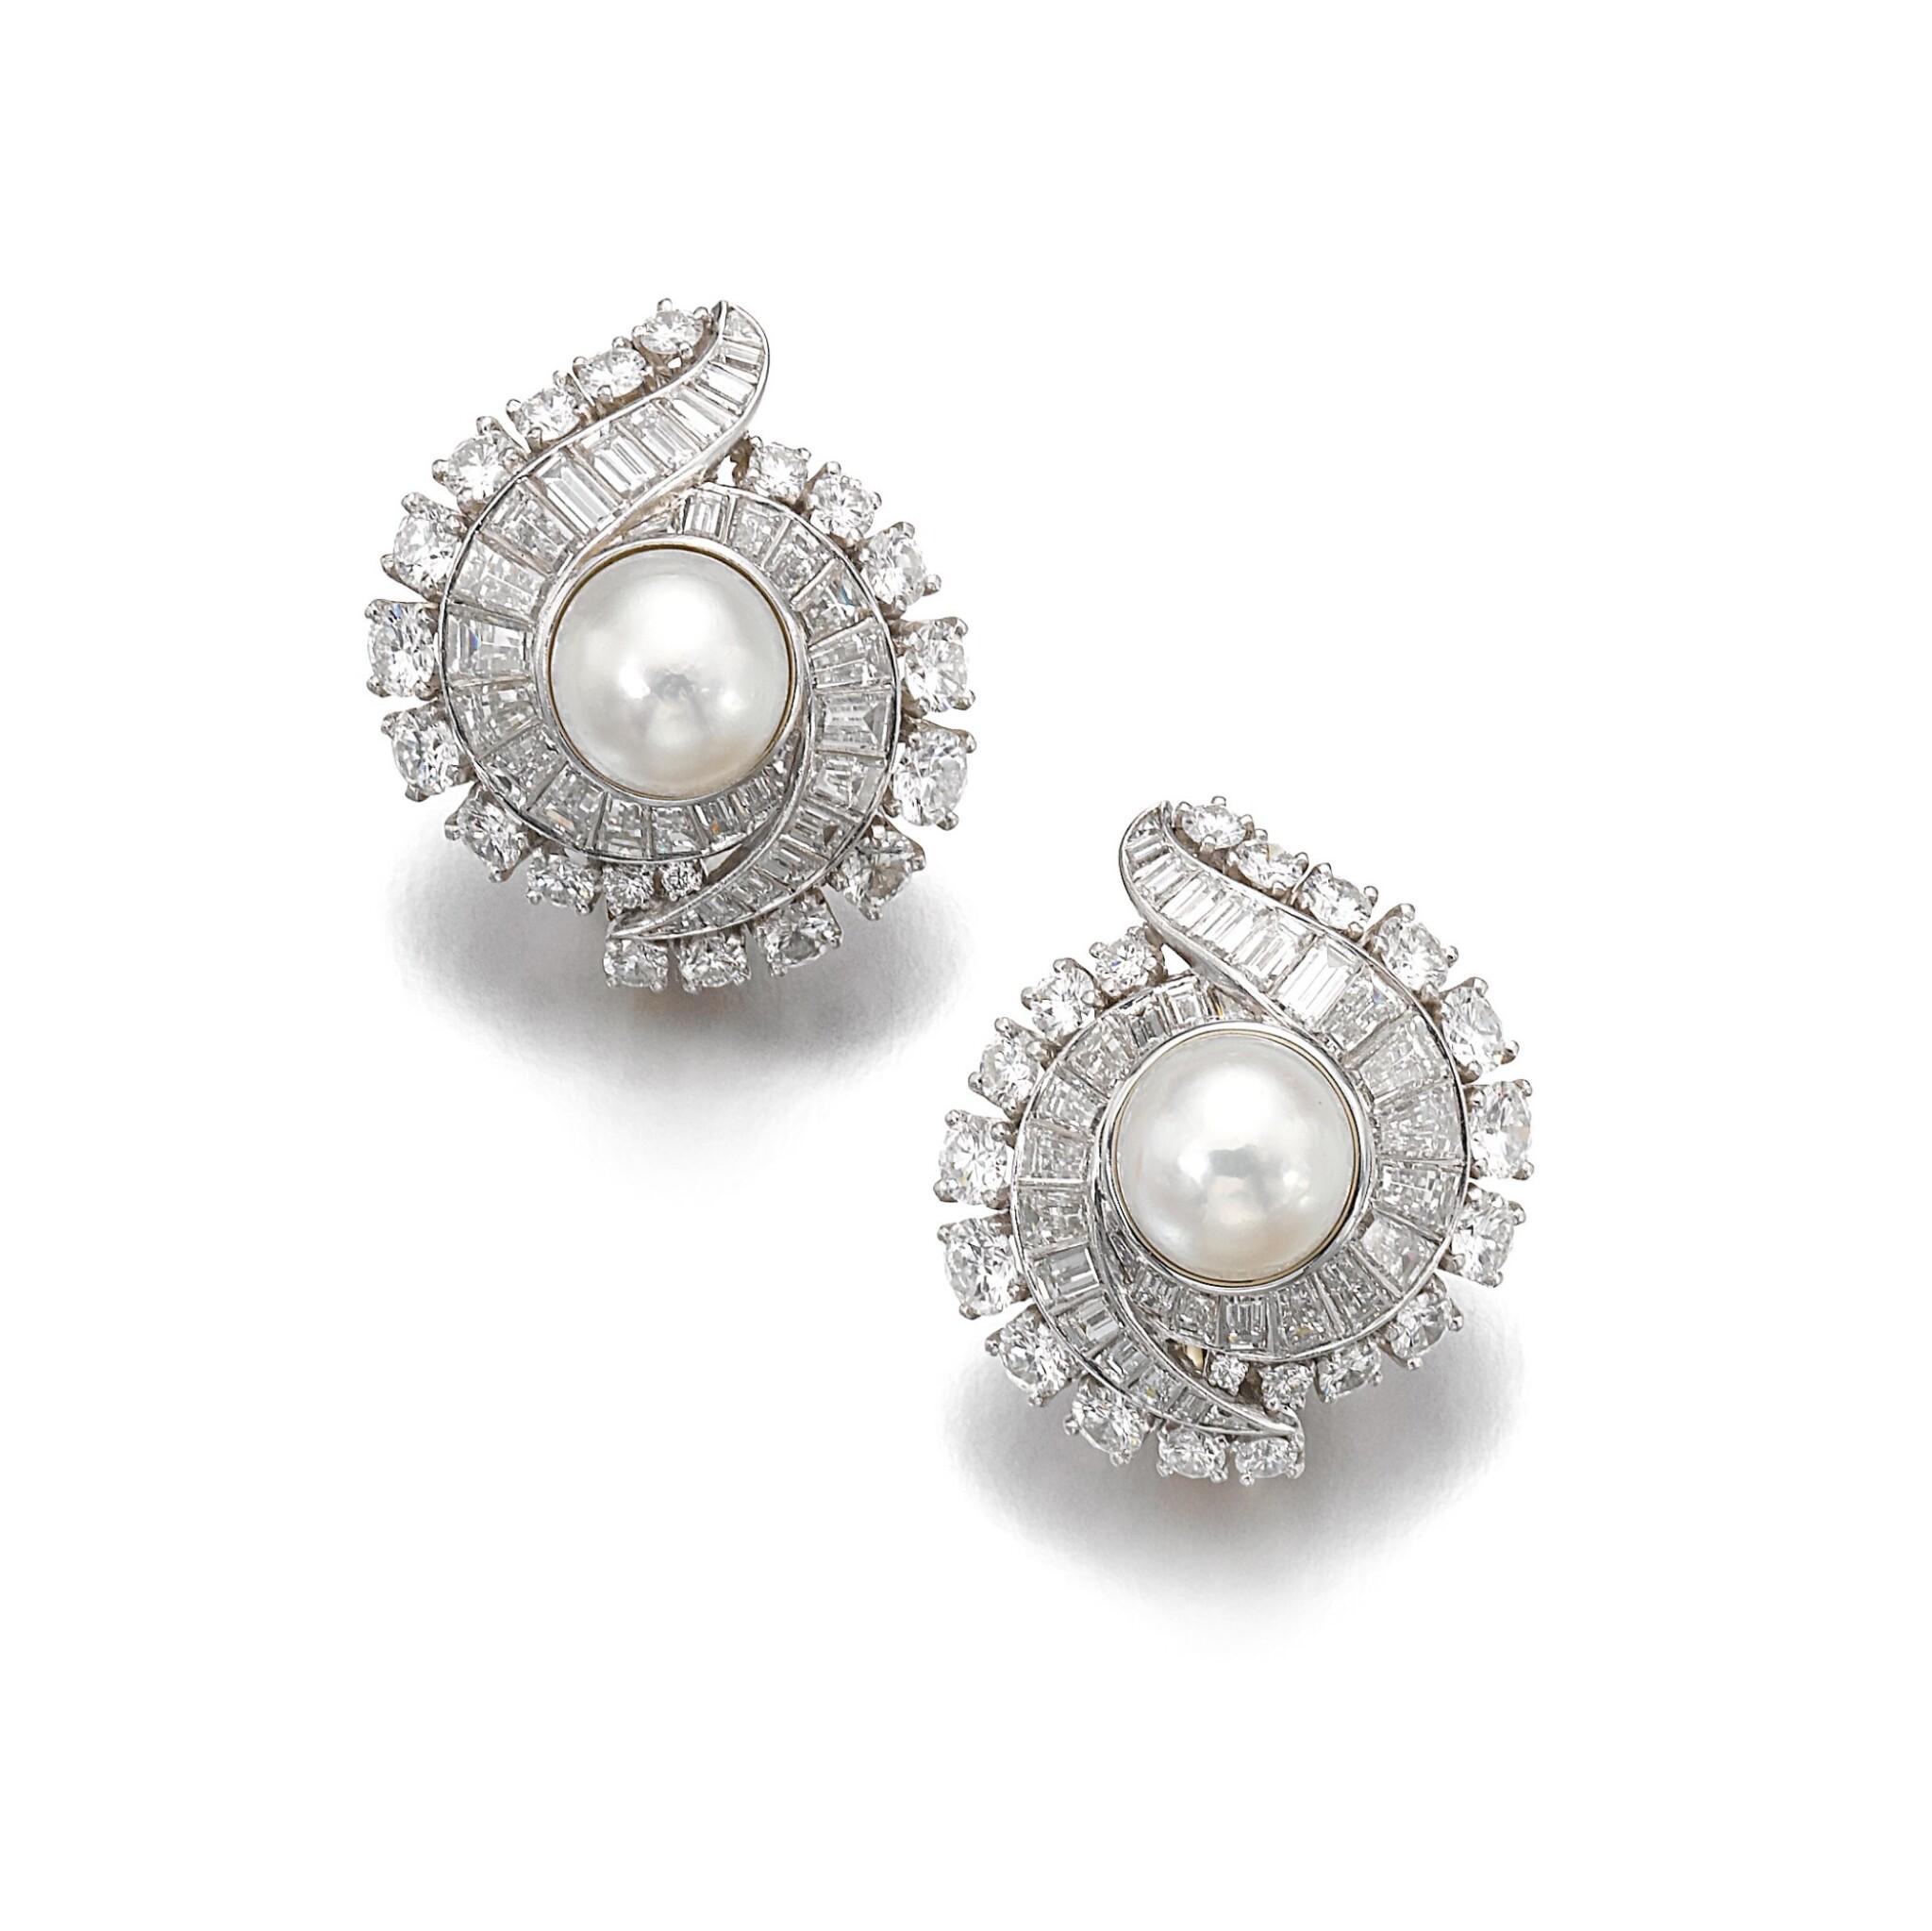 VAN CLEEF & ARPELS [ 梵克雅寶] | PAIR OF NATURAL PEARL AND DIAMOND EAR CLIPS, CIRCA 1960 [天然珍珠配鑽石耳環一對,約1960年]